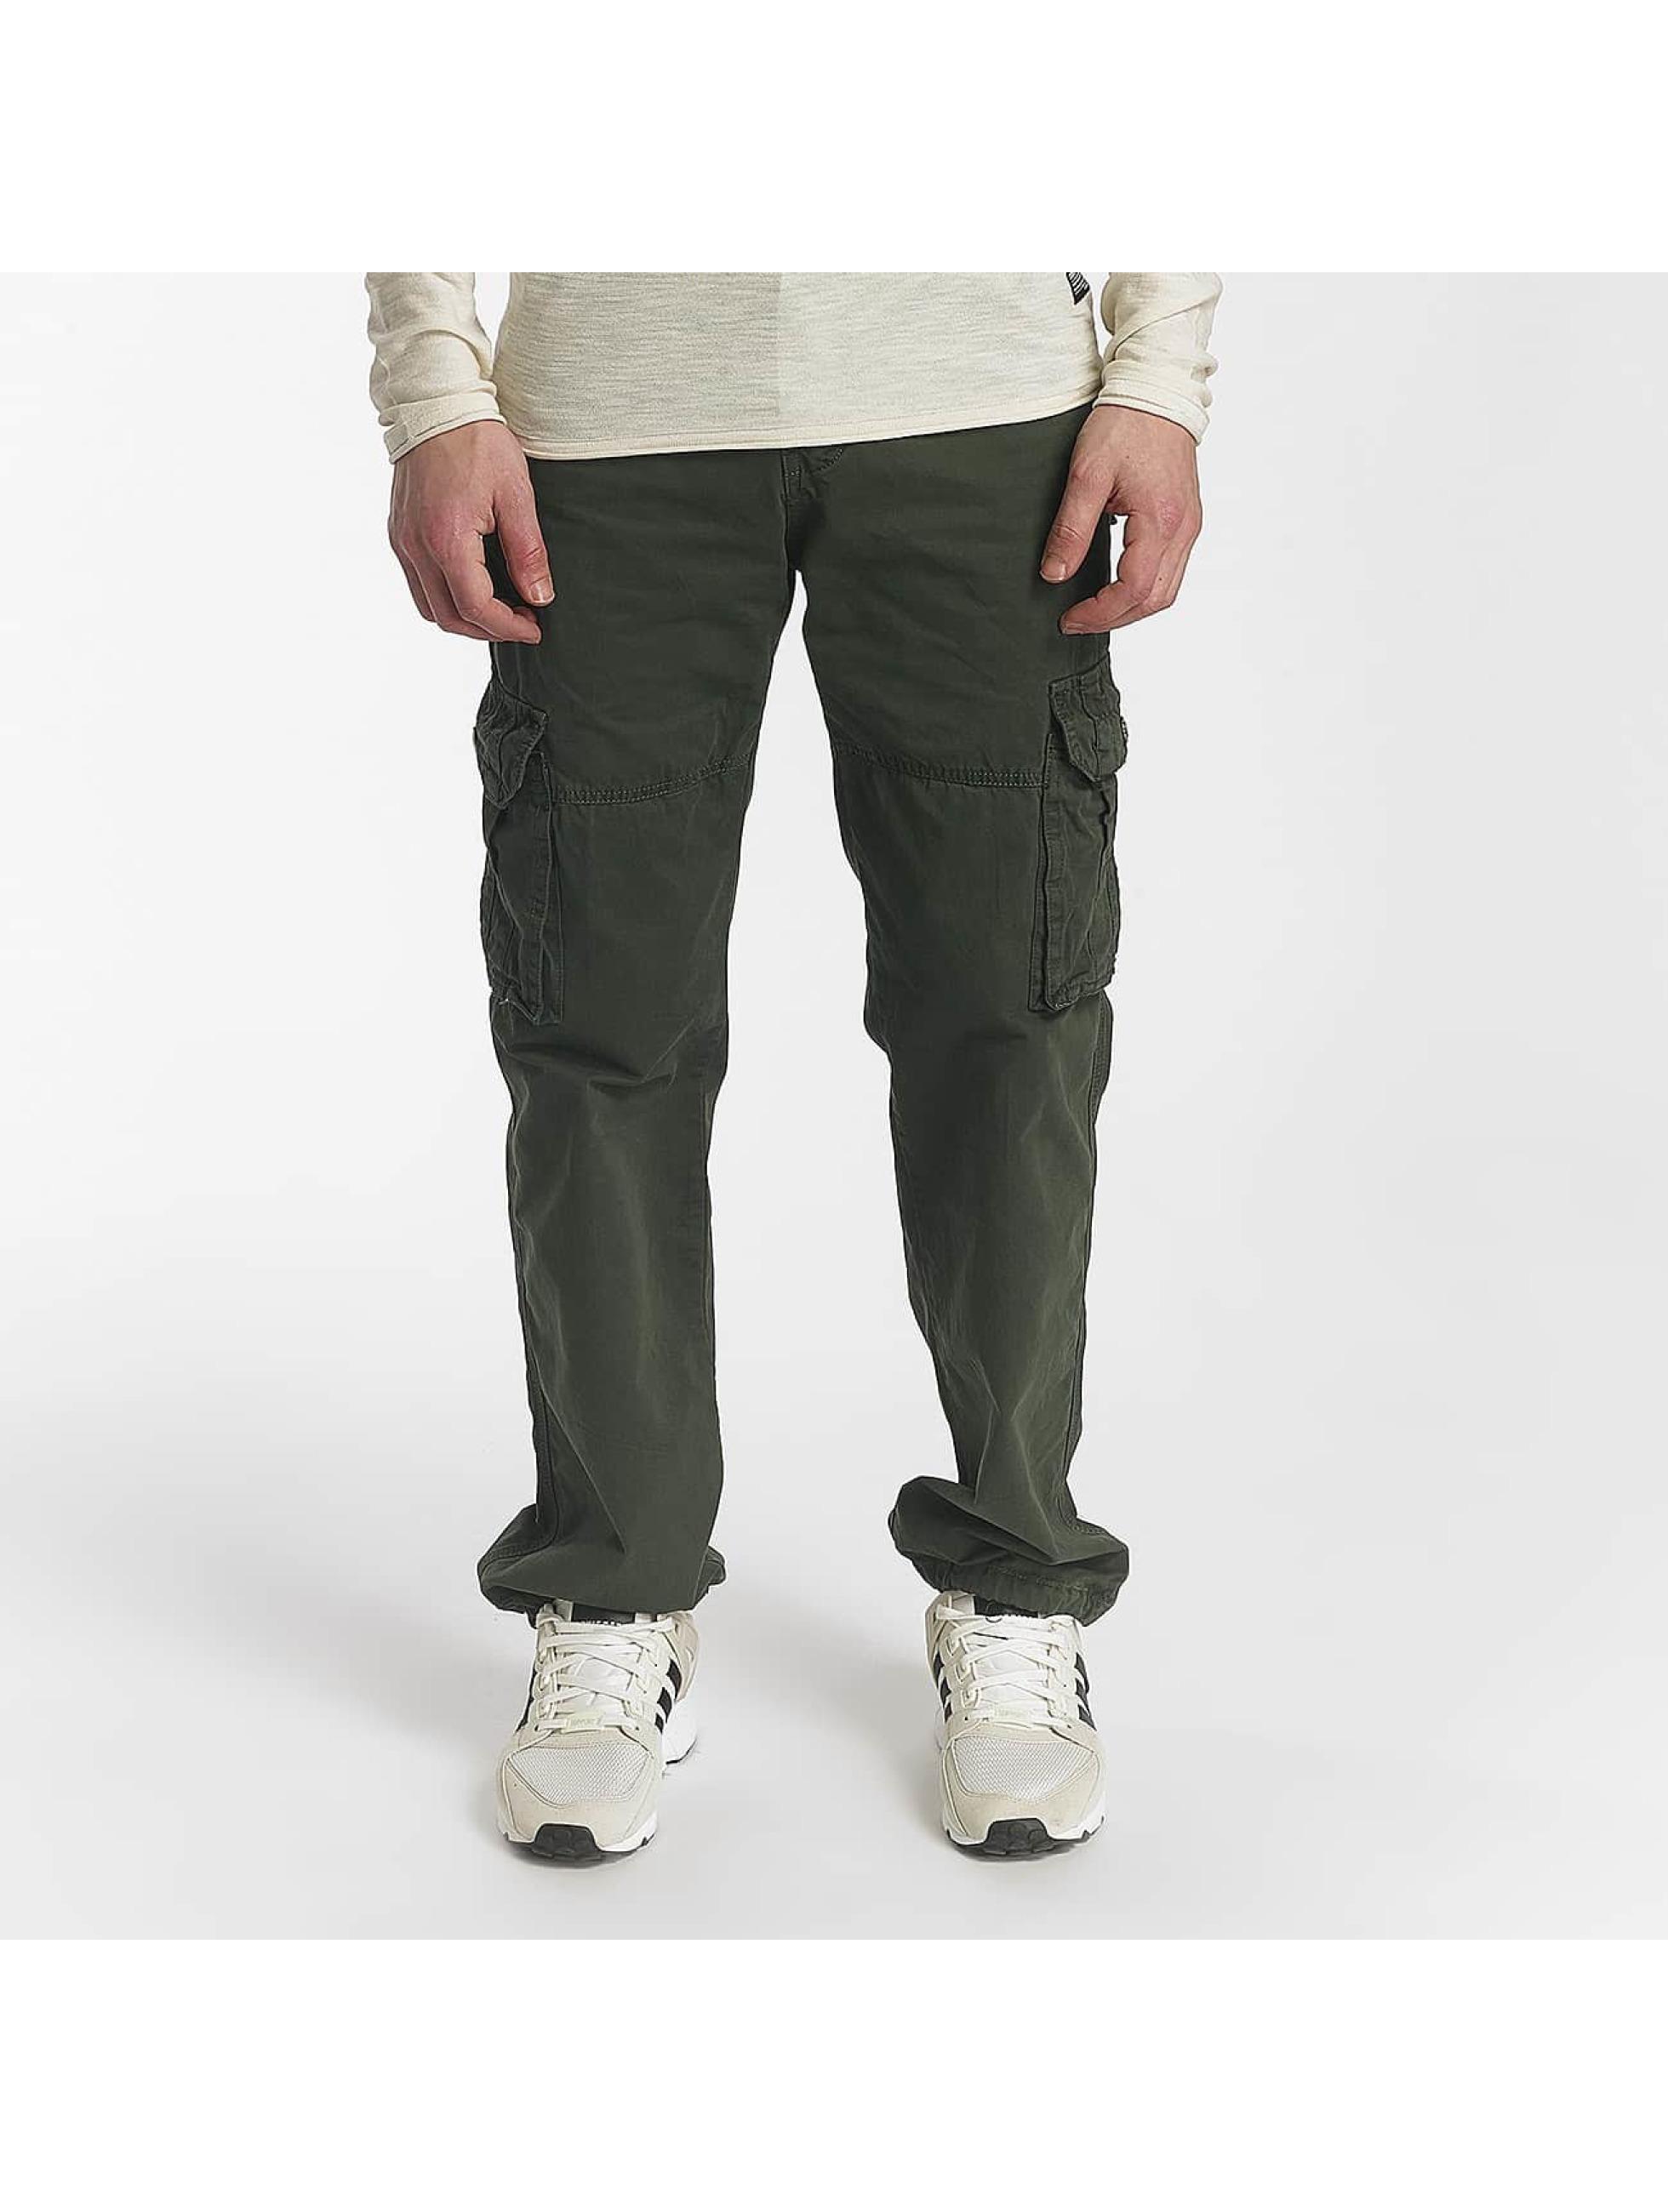 Leg Kings Loose Fit Jeans Bags grün